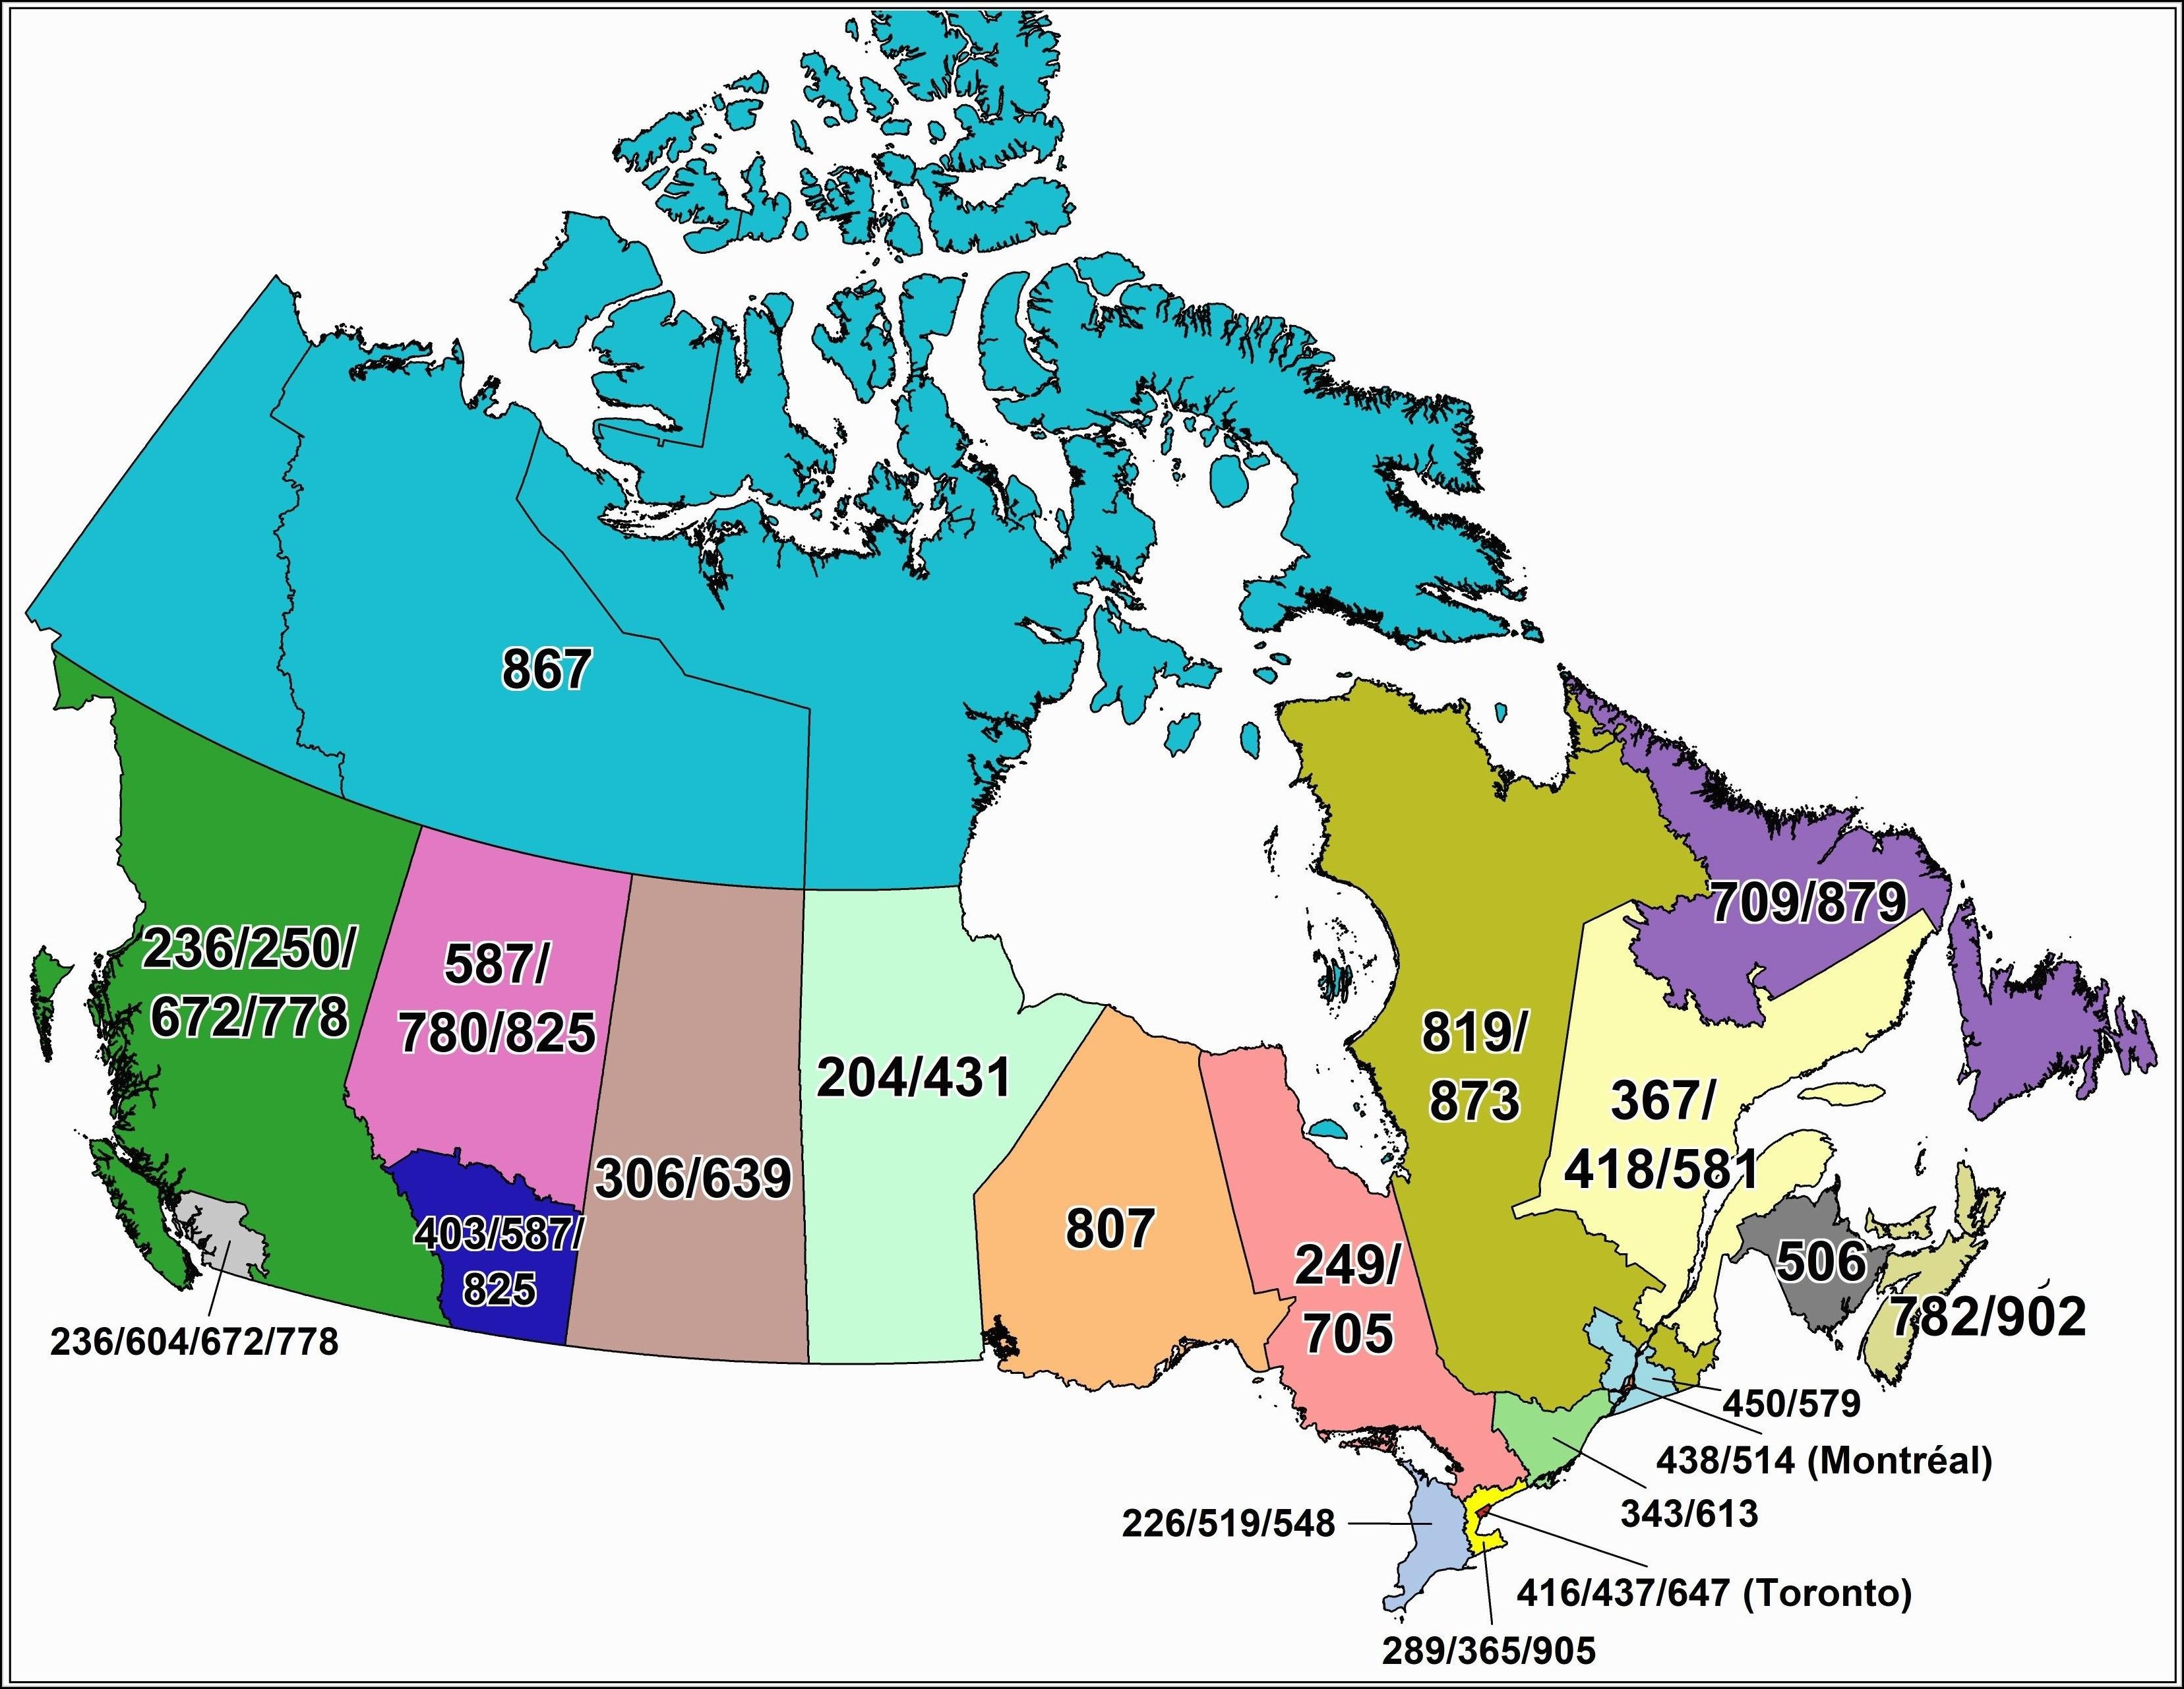 Garmin Canada Map Free - Map : Resume Examples #My3aXBmKwp on garmin marine charts canada, garmin map upload, garmin map updates, delorme canada maps, garmin north america, google canada maps, lowrance canada maps,